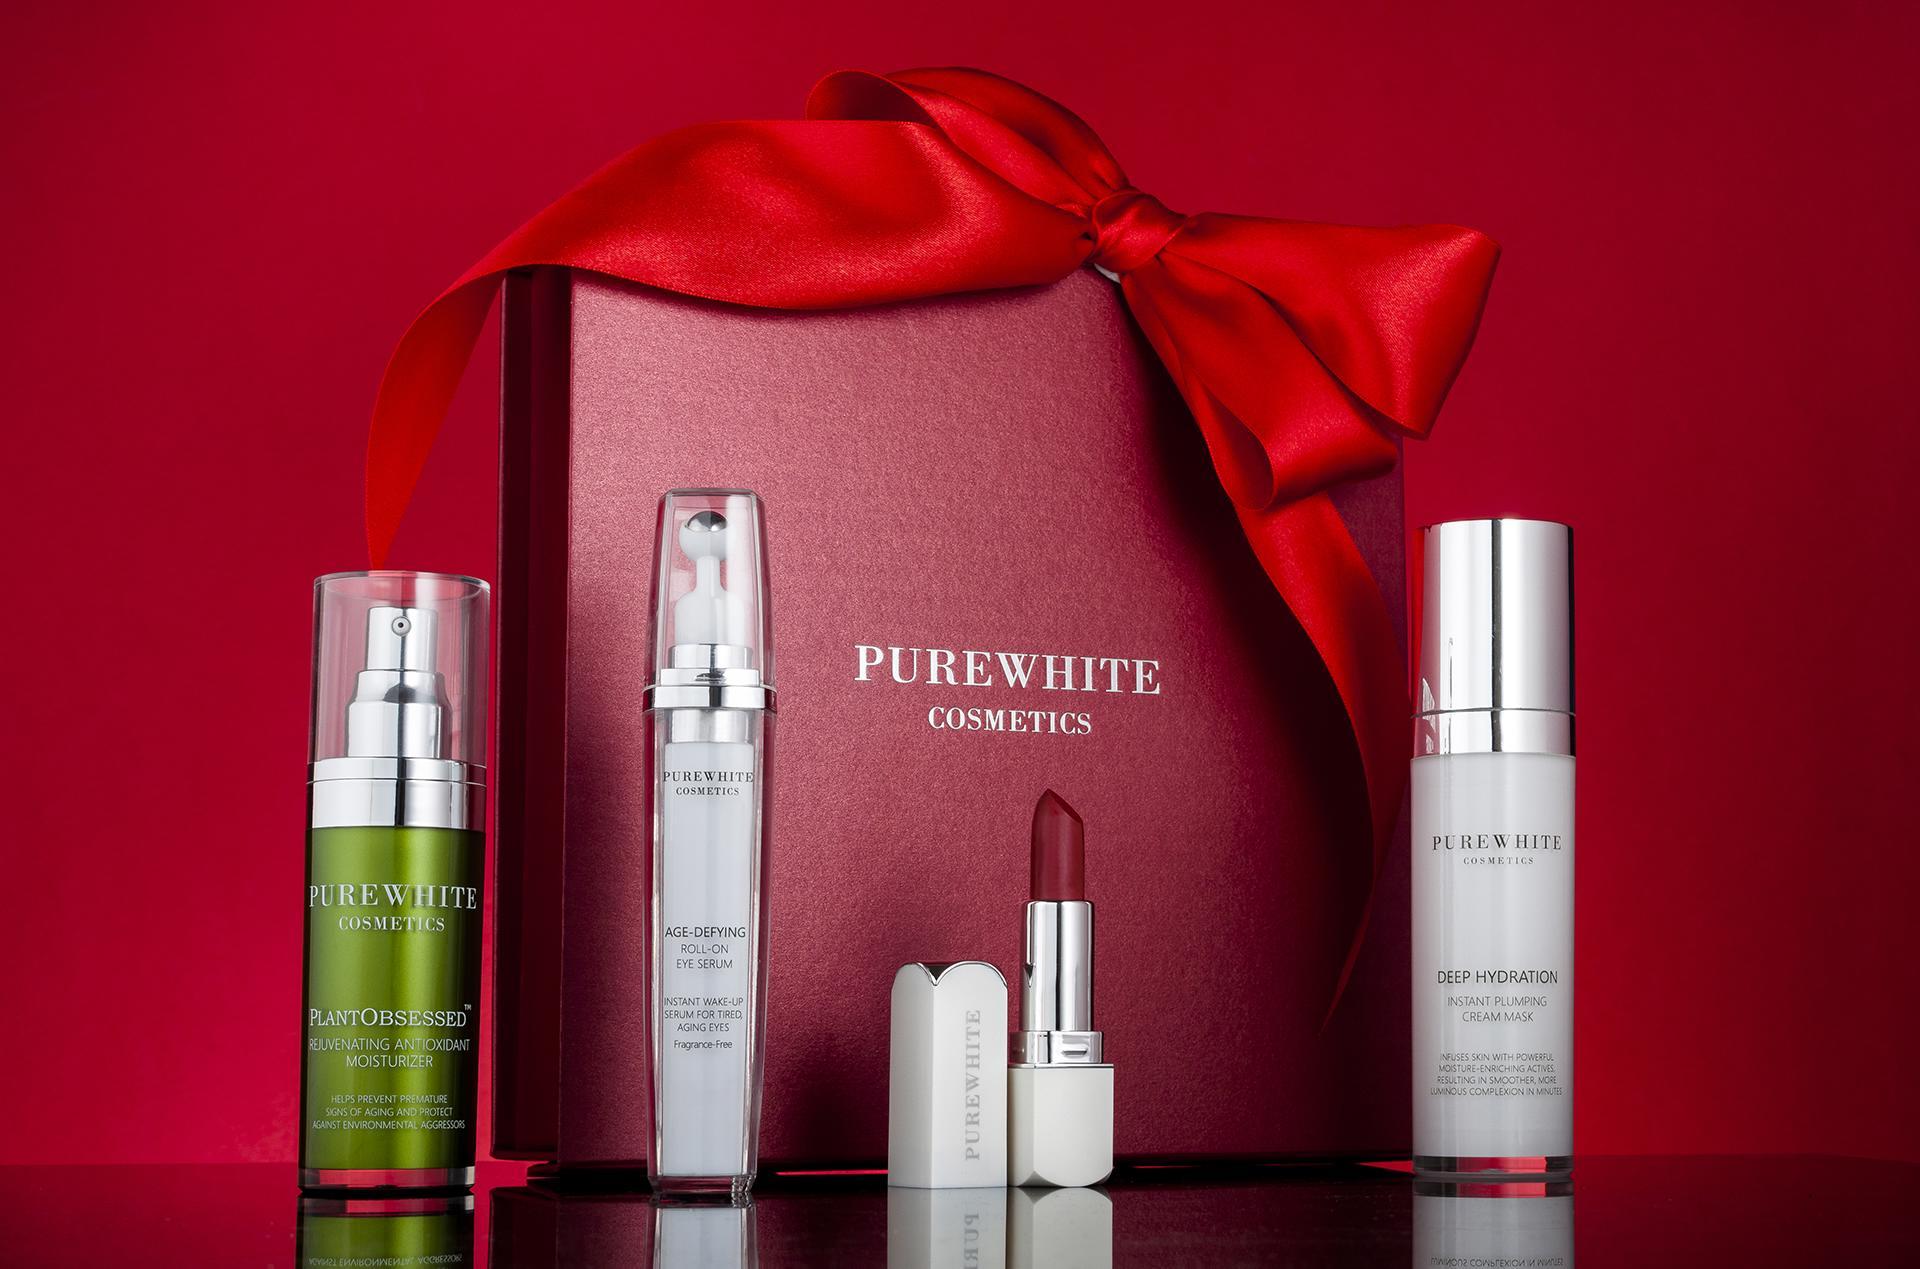 Pure White Cosmetics - Youthful Radiance Set